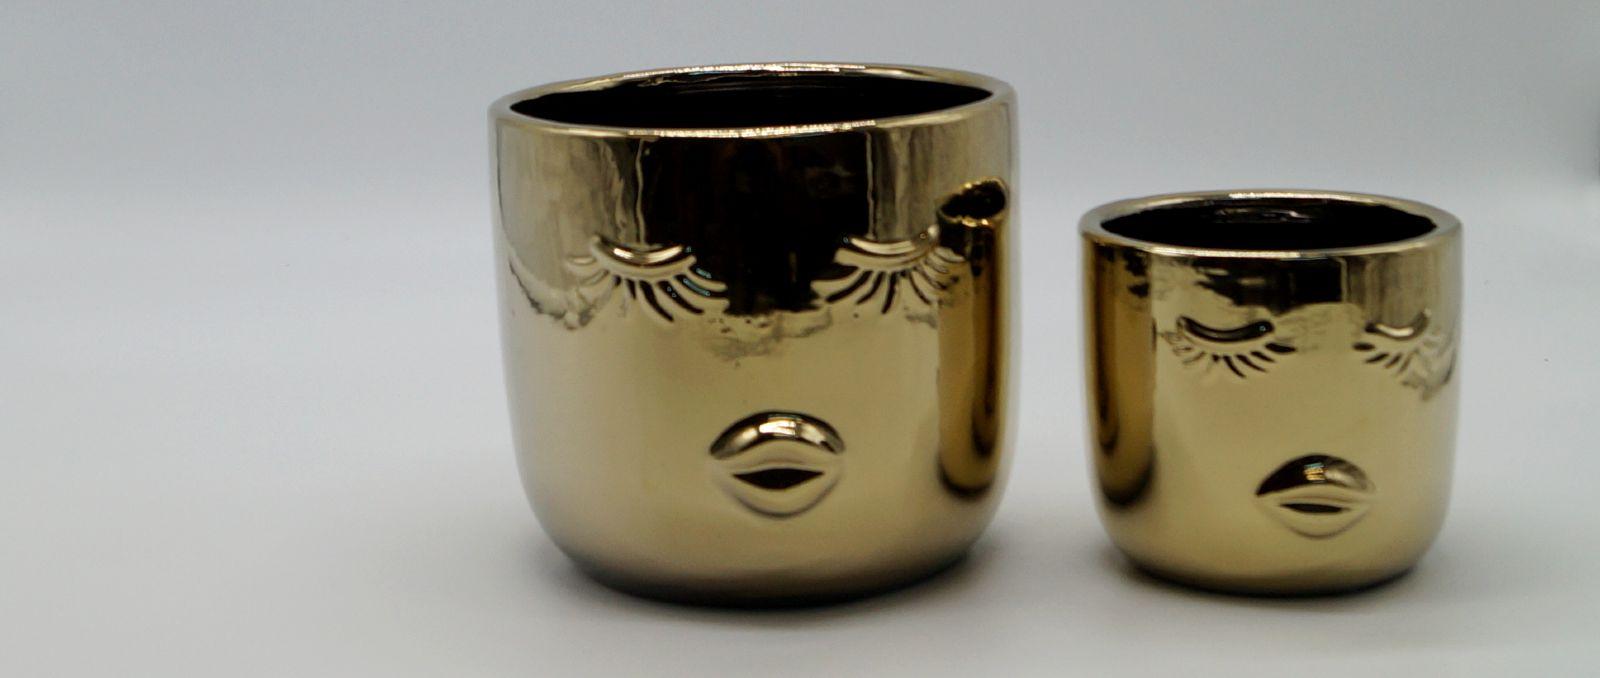 pots-golden-lady-style-desktop